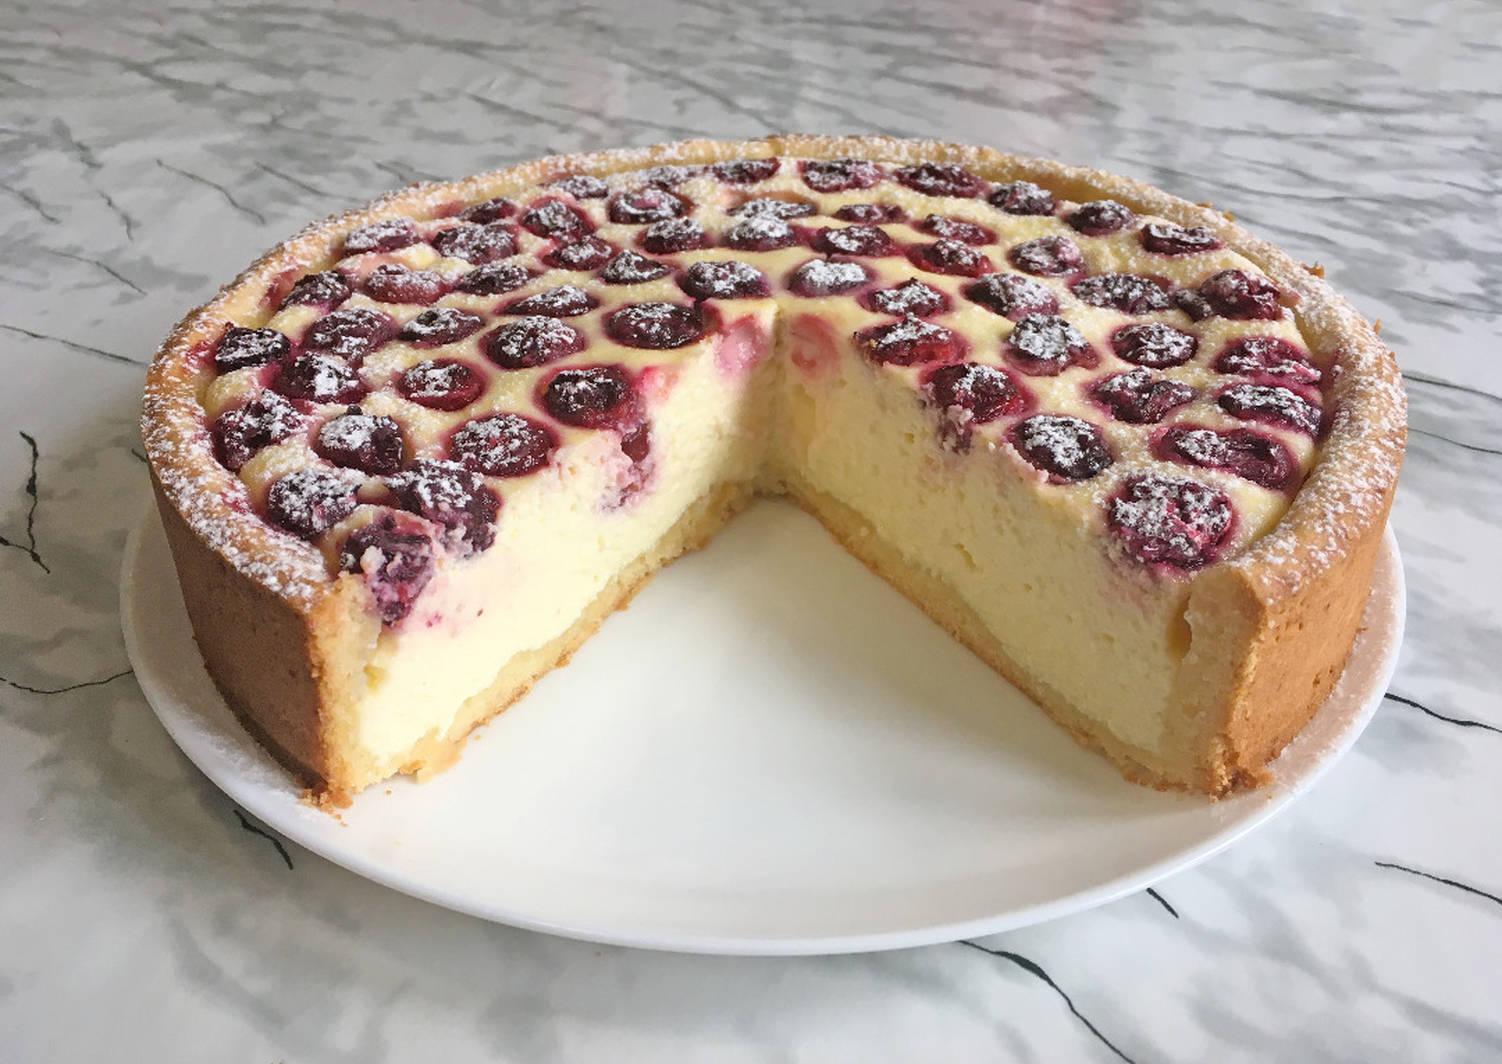 порно рецепт ягодного пирога с фото годом лошади